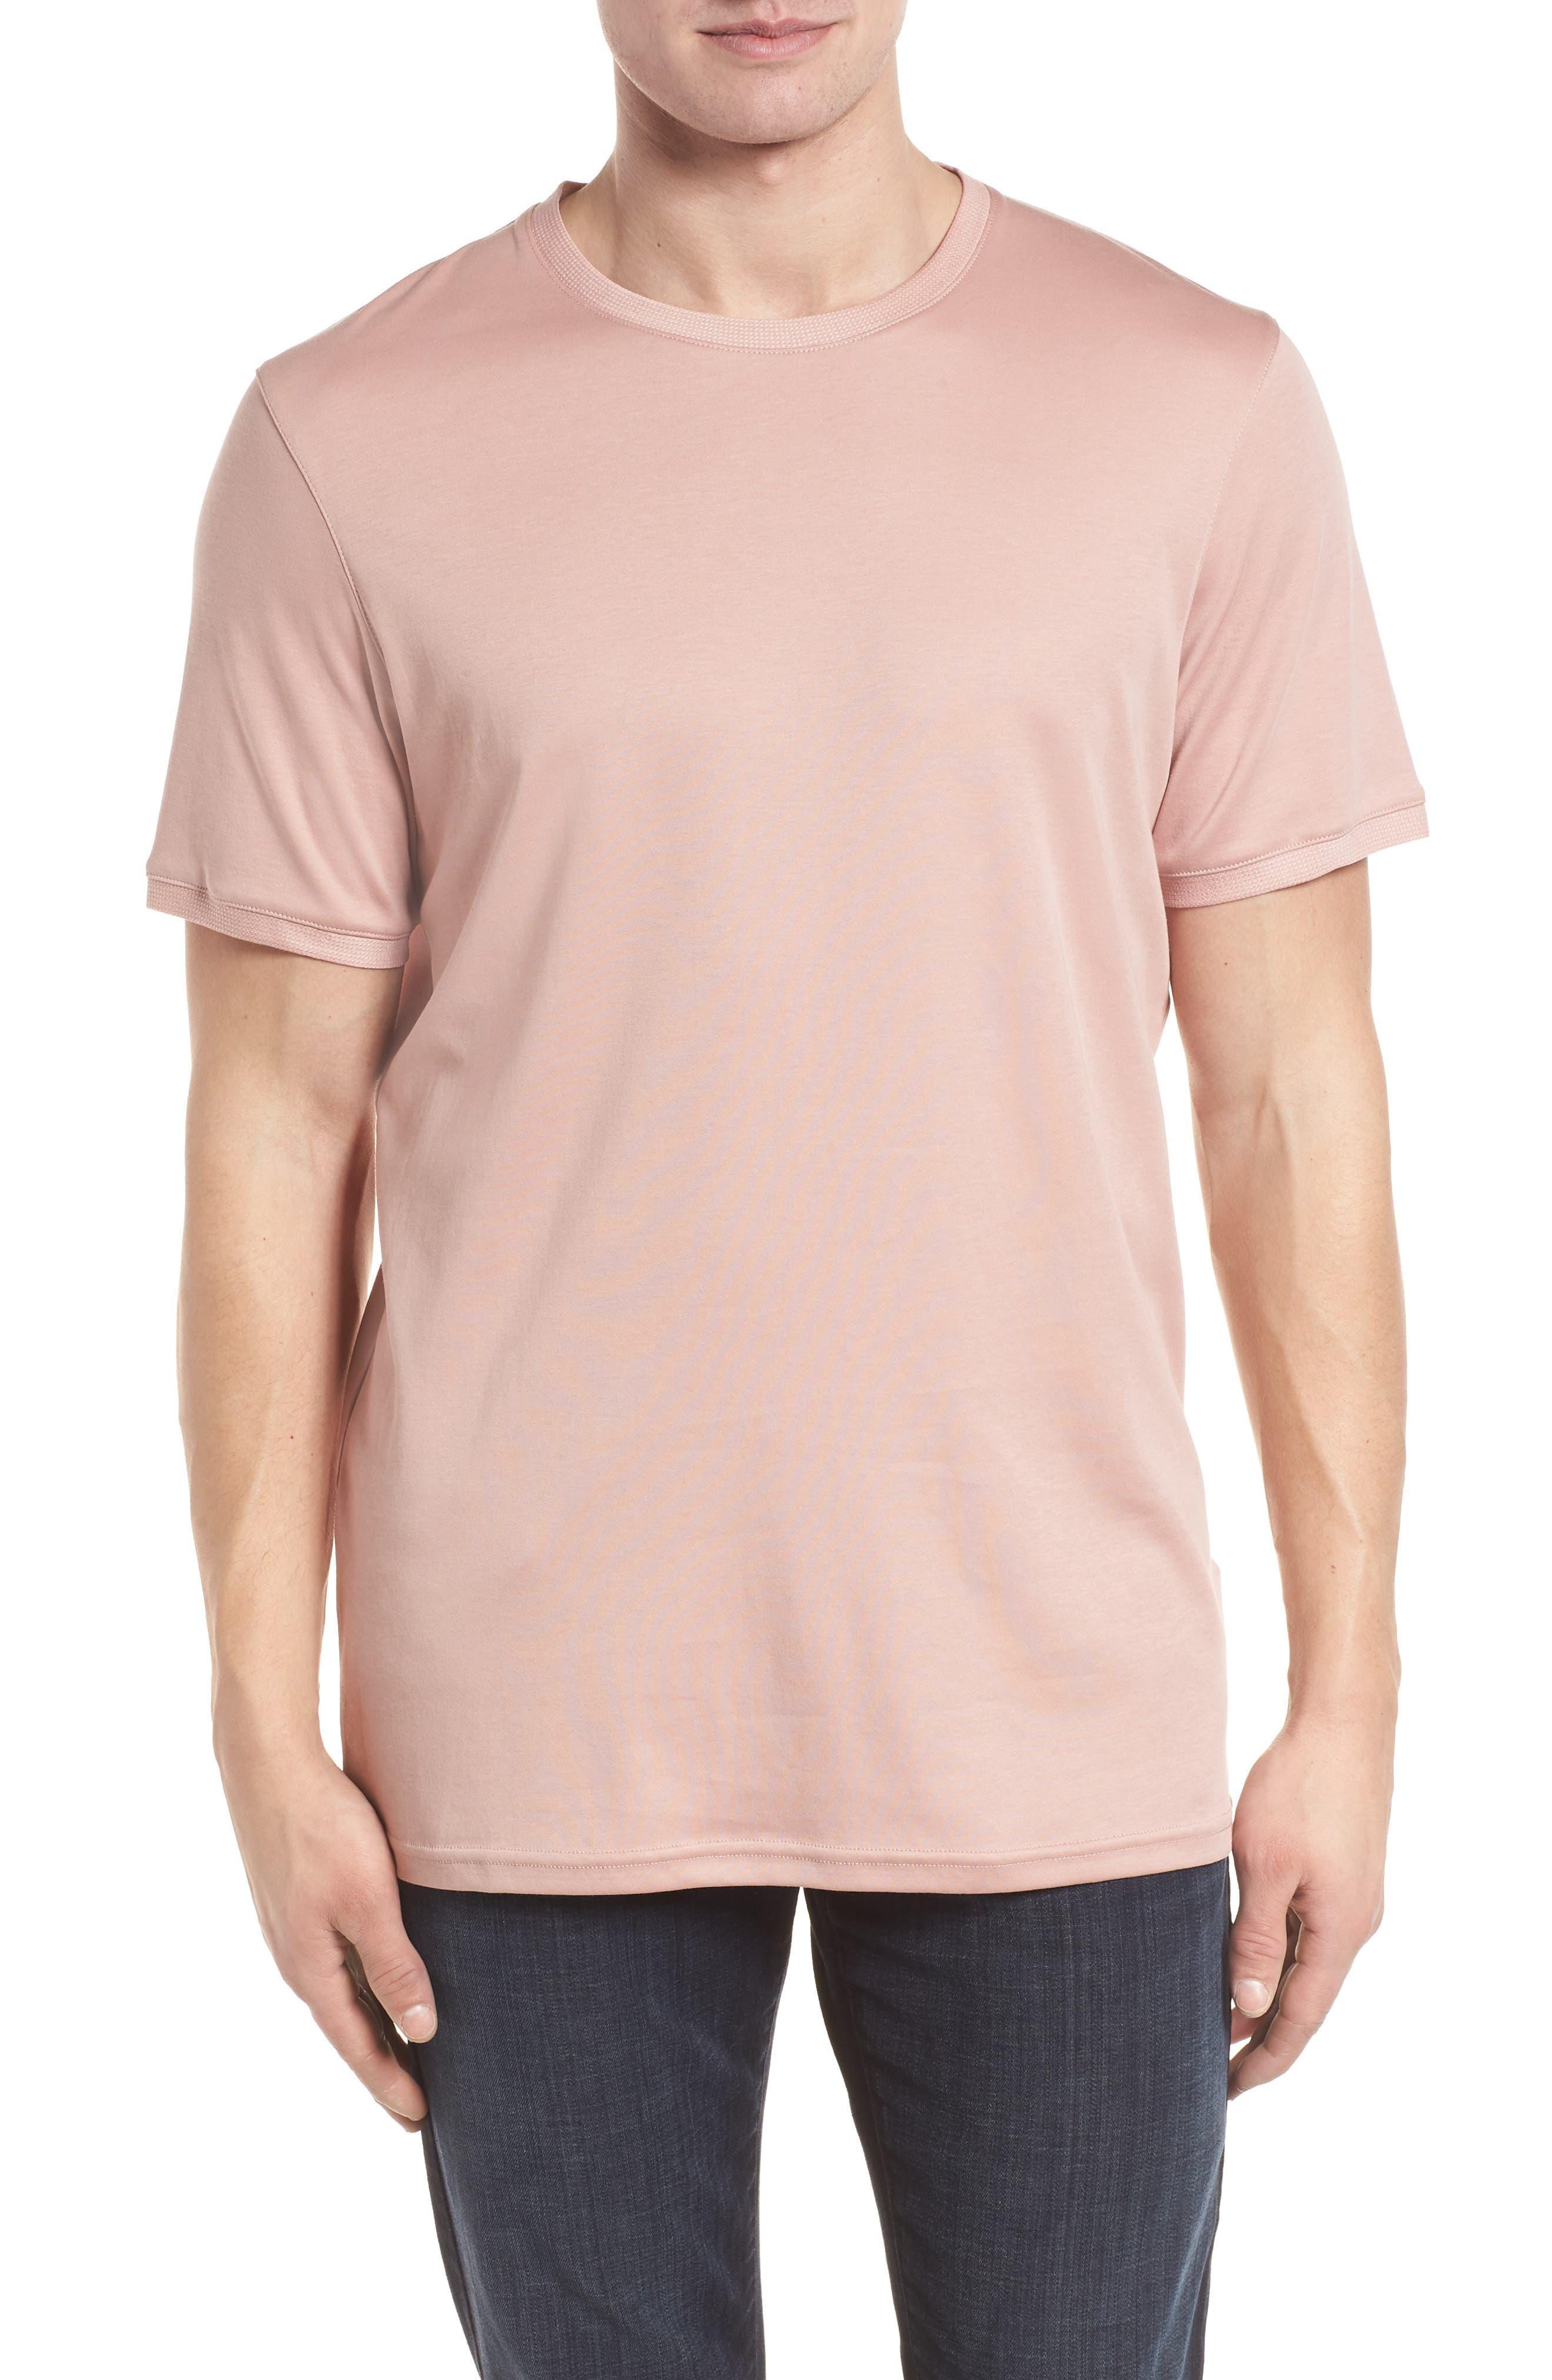 Piktt Crewneck T-Shirt,                         Main,                         color, Dusky Pink